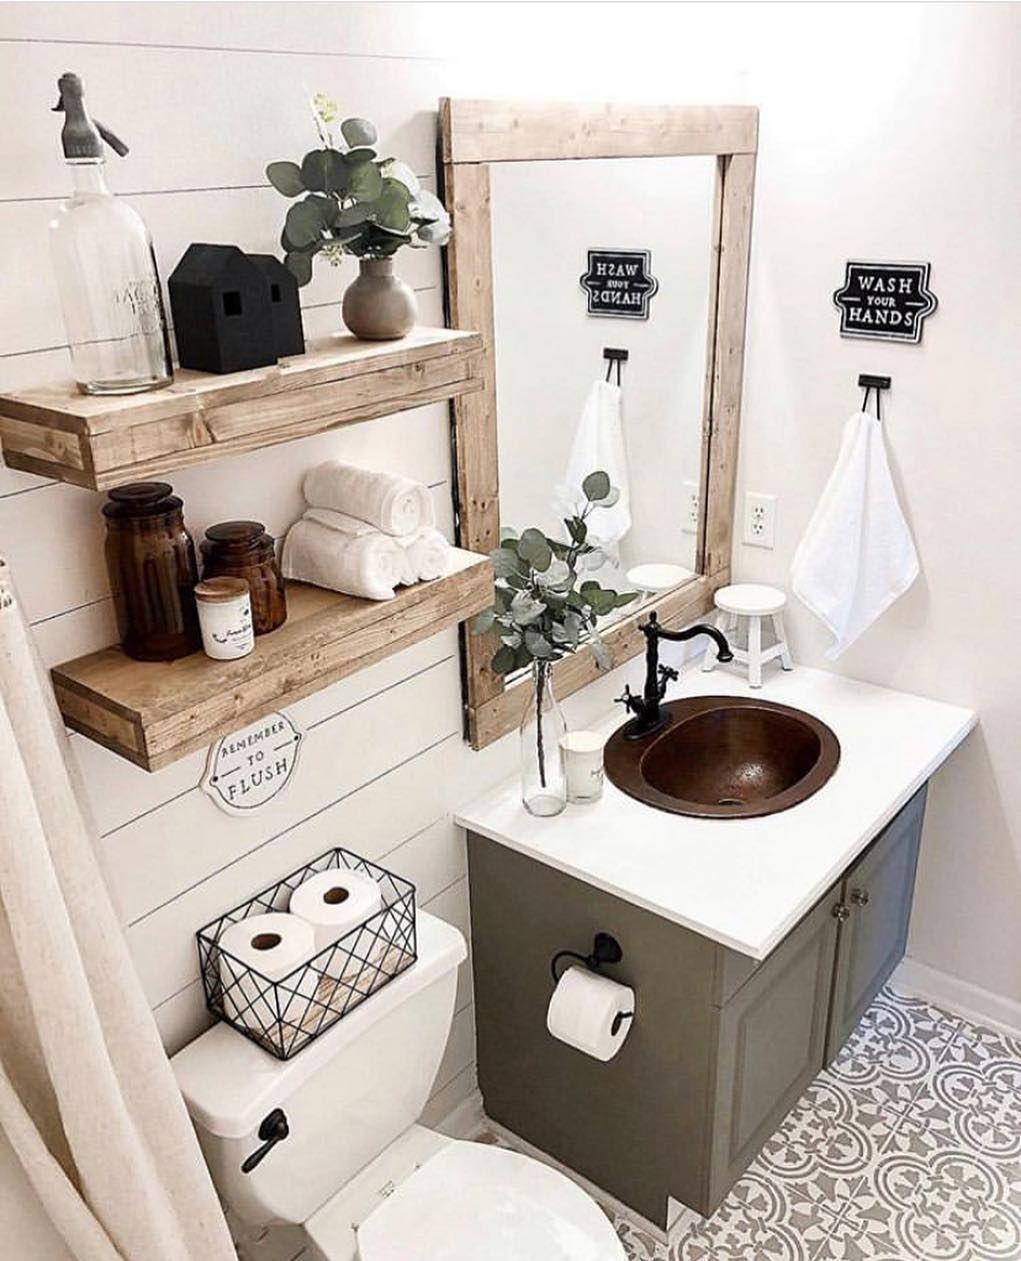 "Interior design + decor ideas on Instagram: ""hello, sunday 👋🏻 another fabulous #modernfarmhouse bathroom 🚽 by the sweet sweet Sierra @withlovesierra 🌟 __ #modernfarmhousedecor…"""